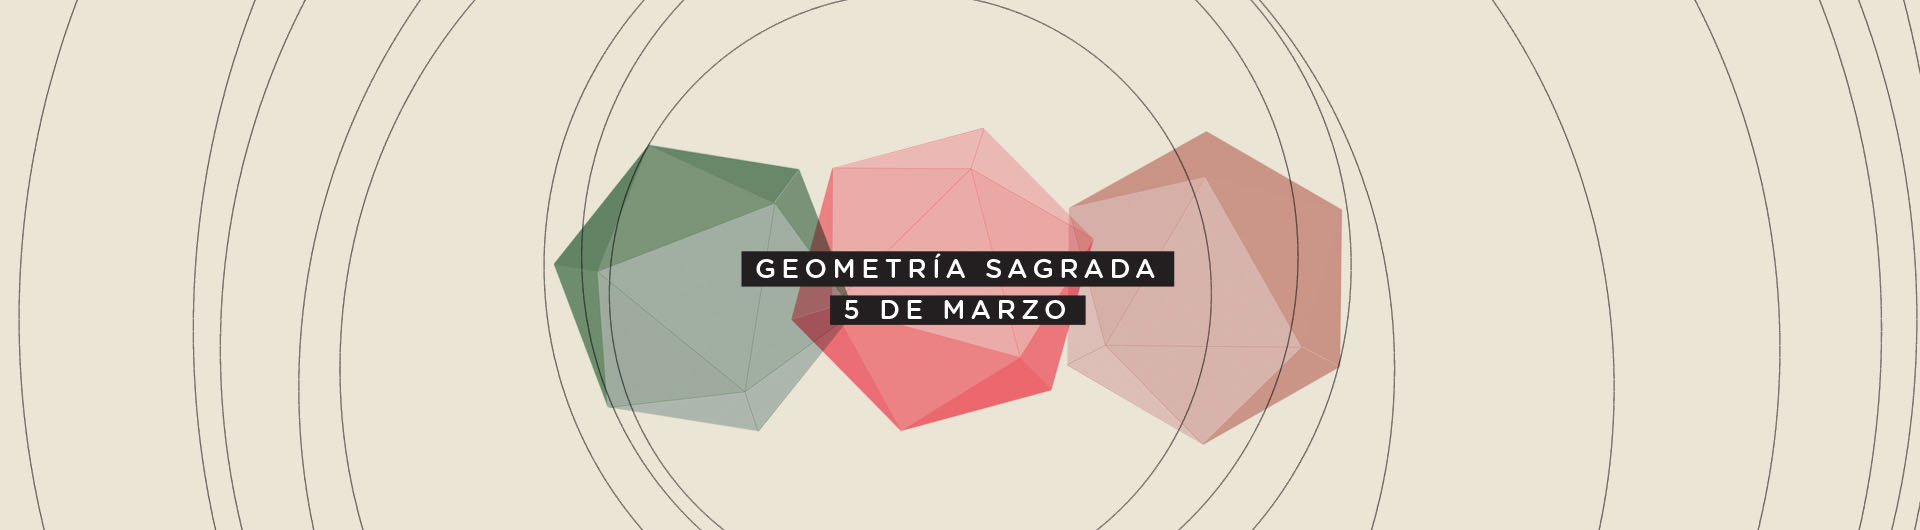 baner-web-geometria-sagrada